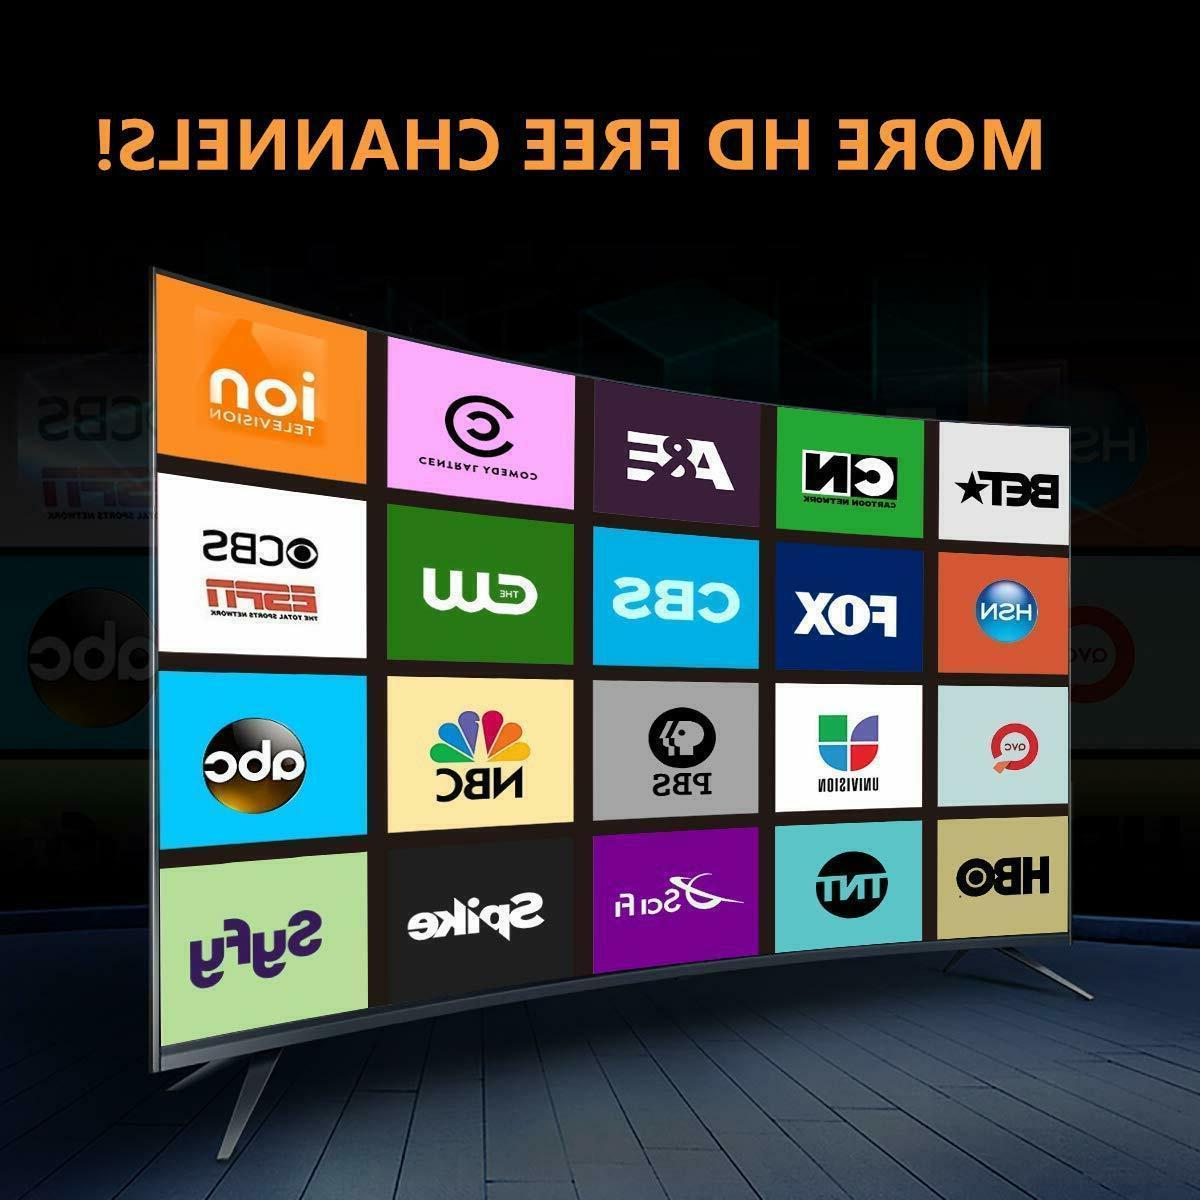 TV Antenna Indoor Amplified Digital TV Antenna Miles 4K 1080P